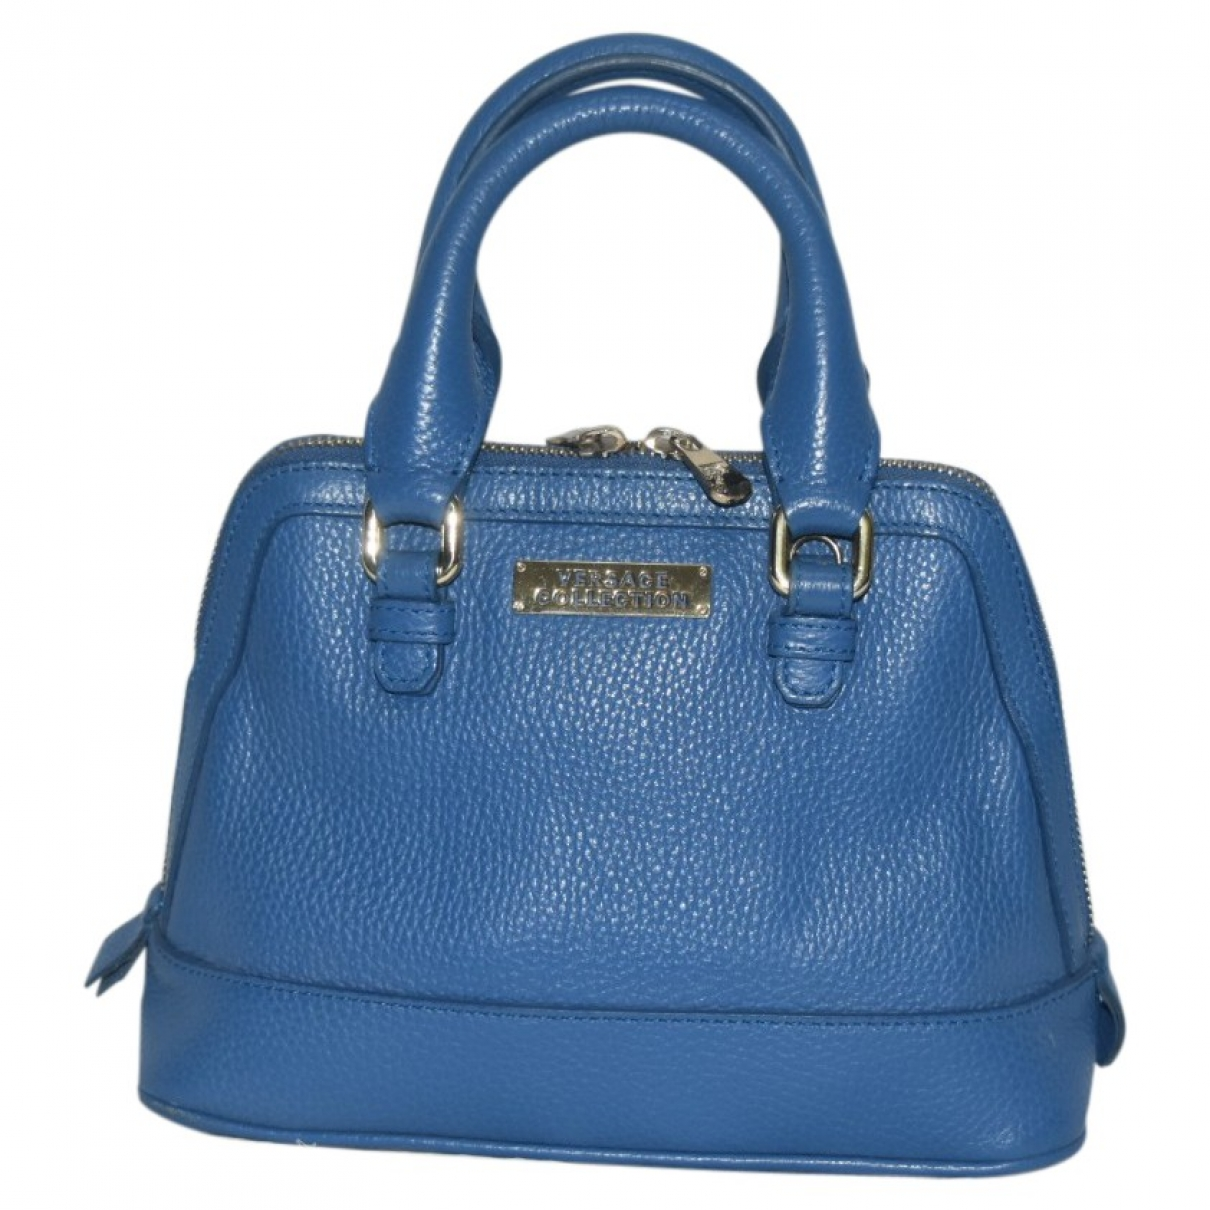 Versace Jeans \N Blue Leather handbag for Women \N